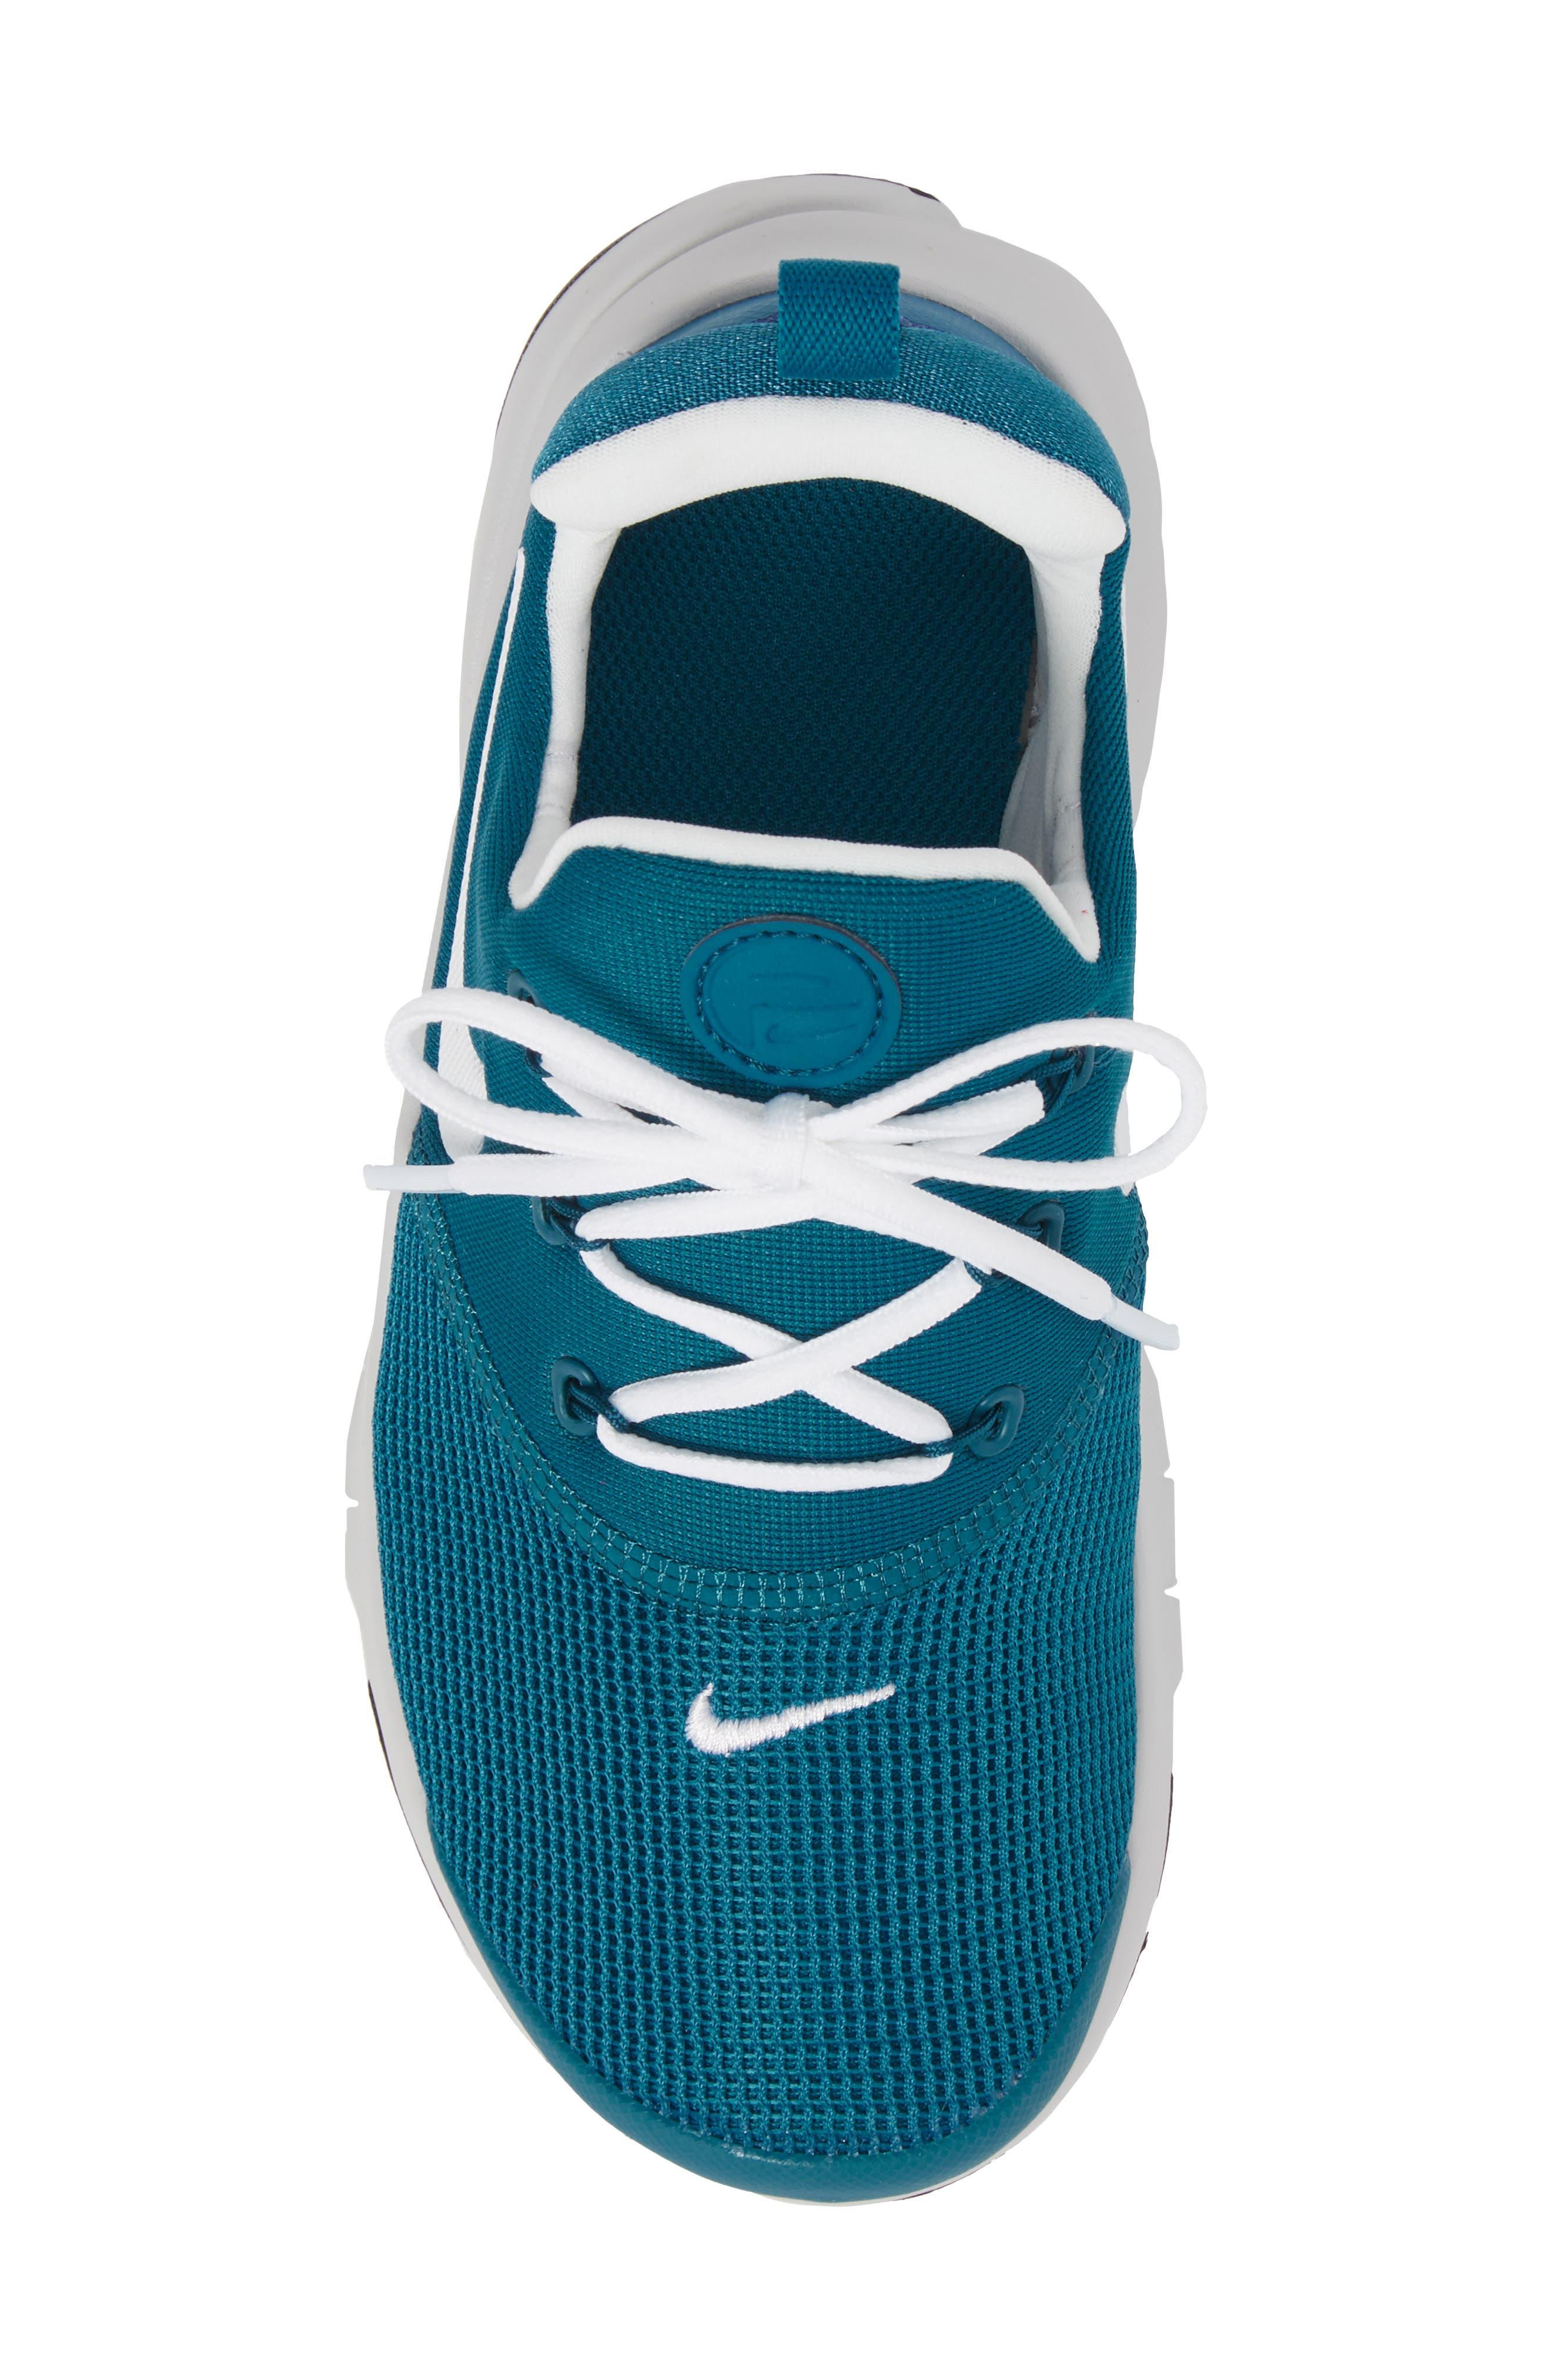 Presto Fly Sneaker,                             Alternate thumbnail 5, color,                             440